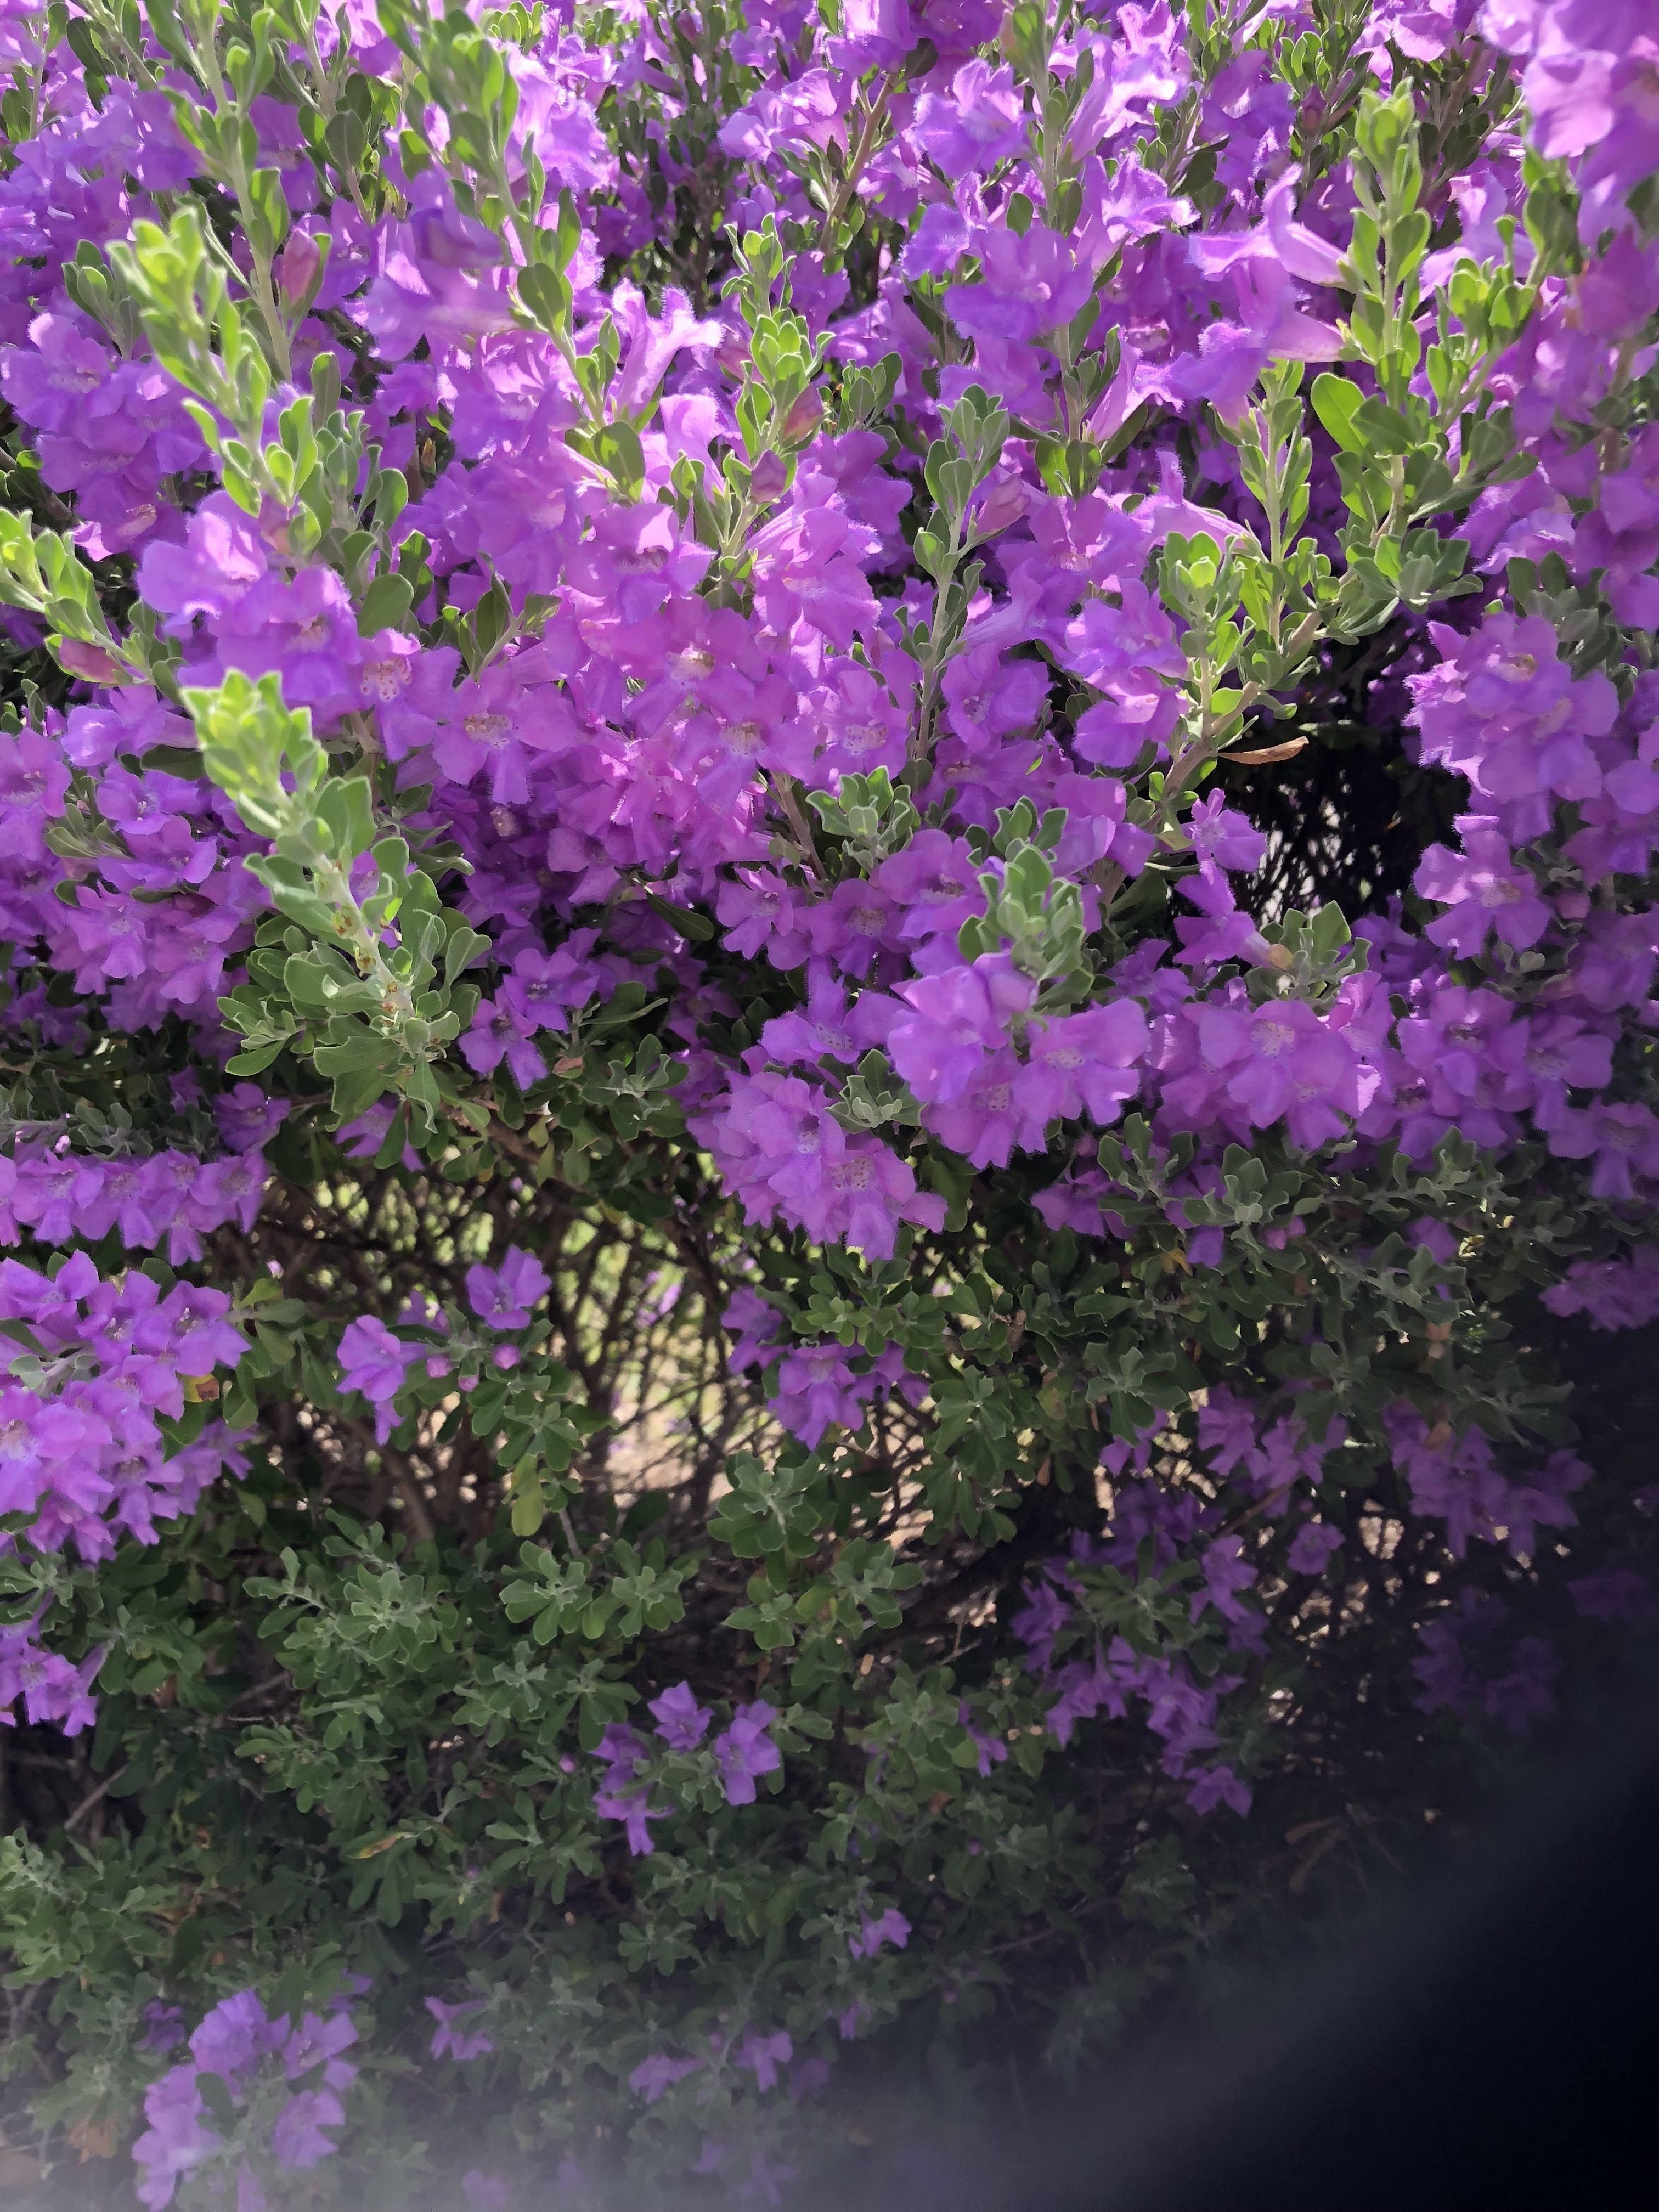 flowering shrubs with purple flowers